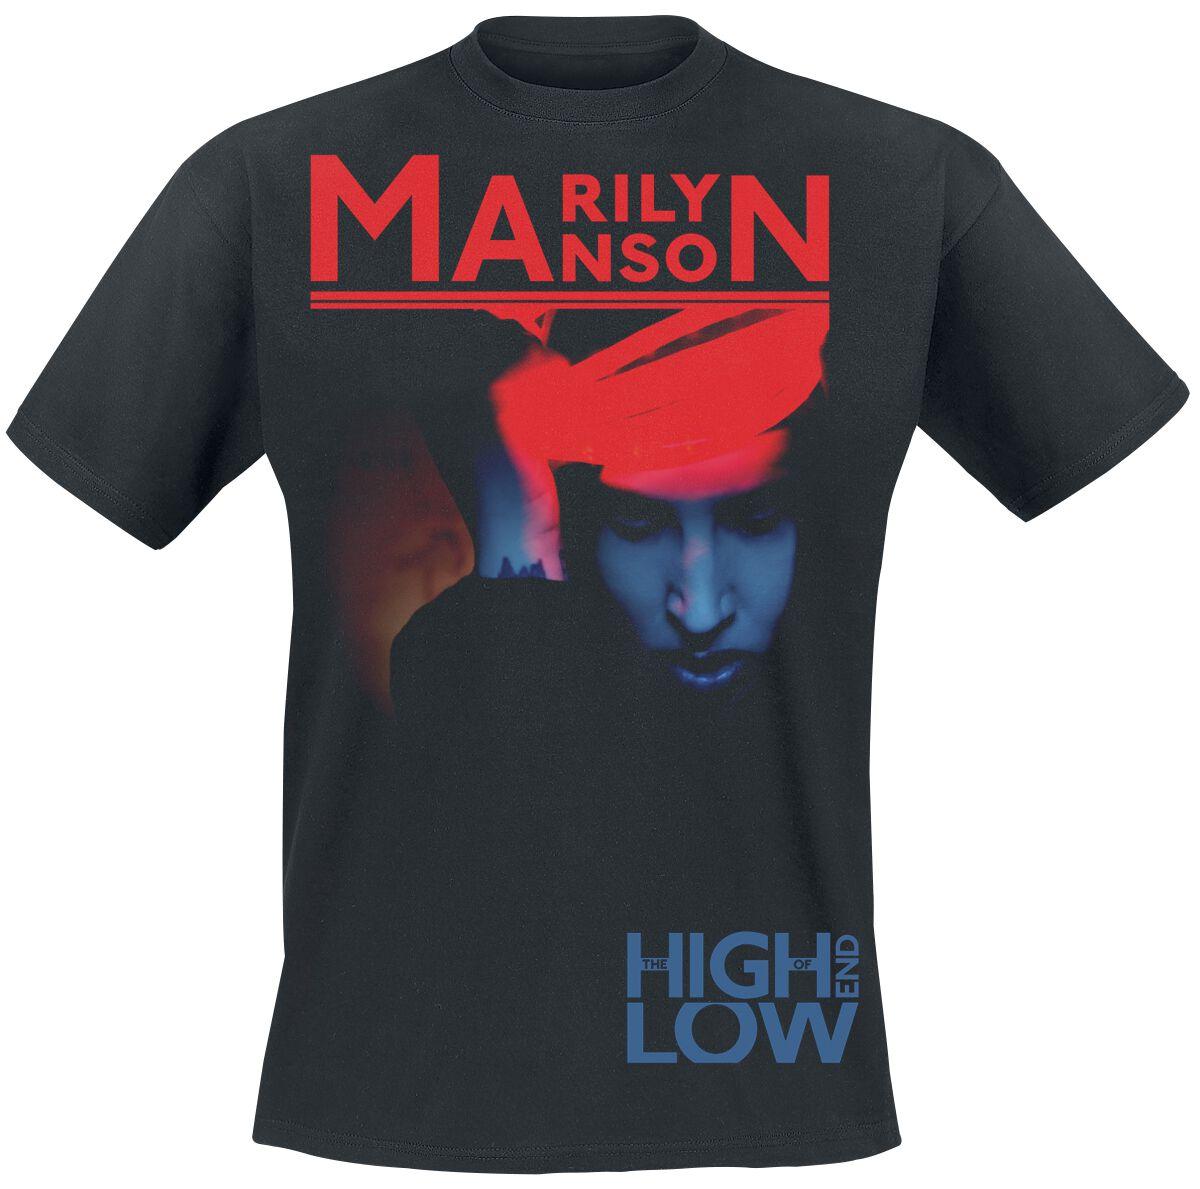 Zespoły - Koszulki - T-Shirt Marilyn Manson High End Of Low T-Shirt czarny - 368066